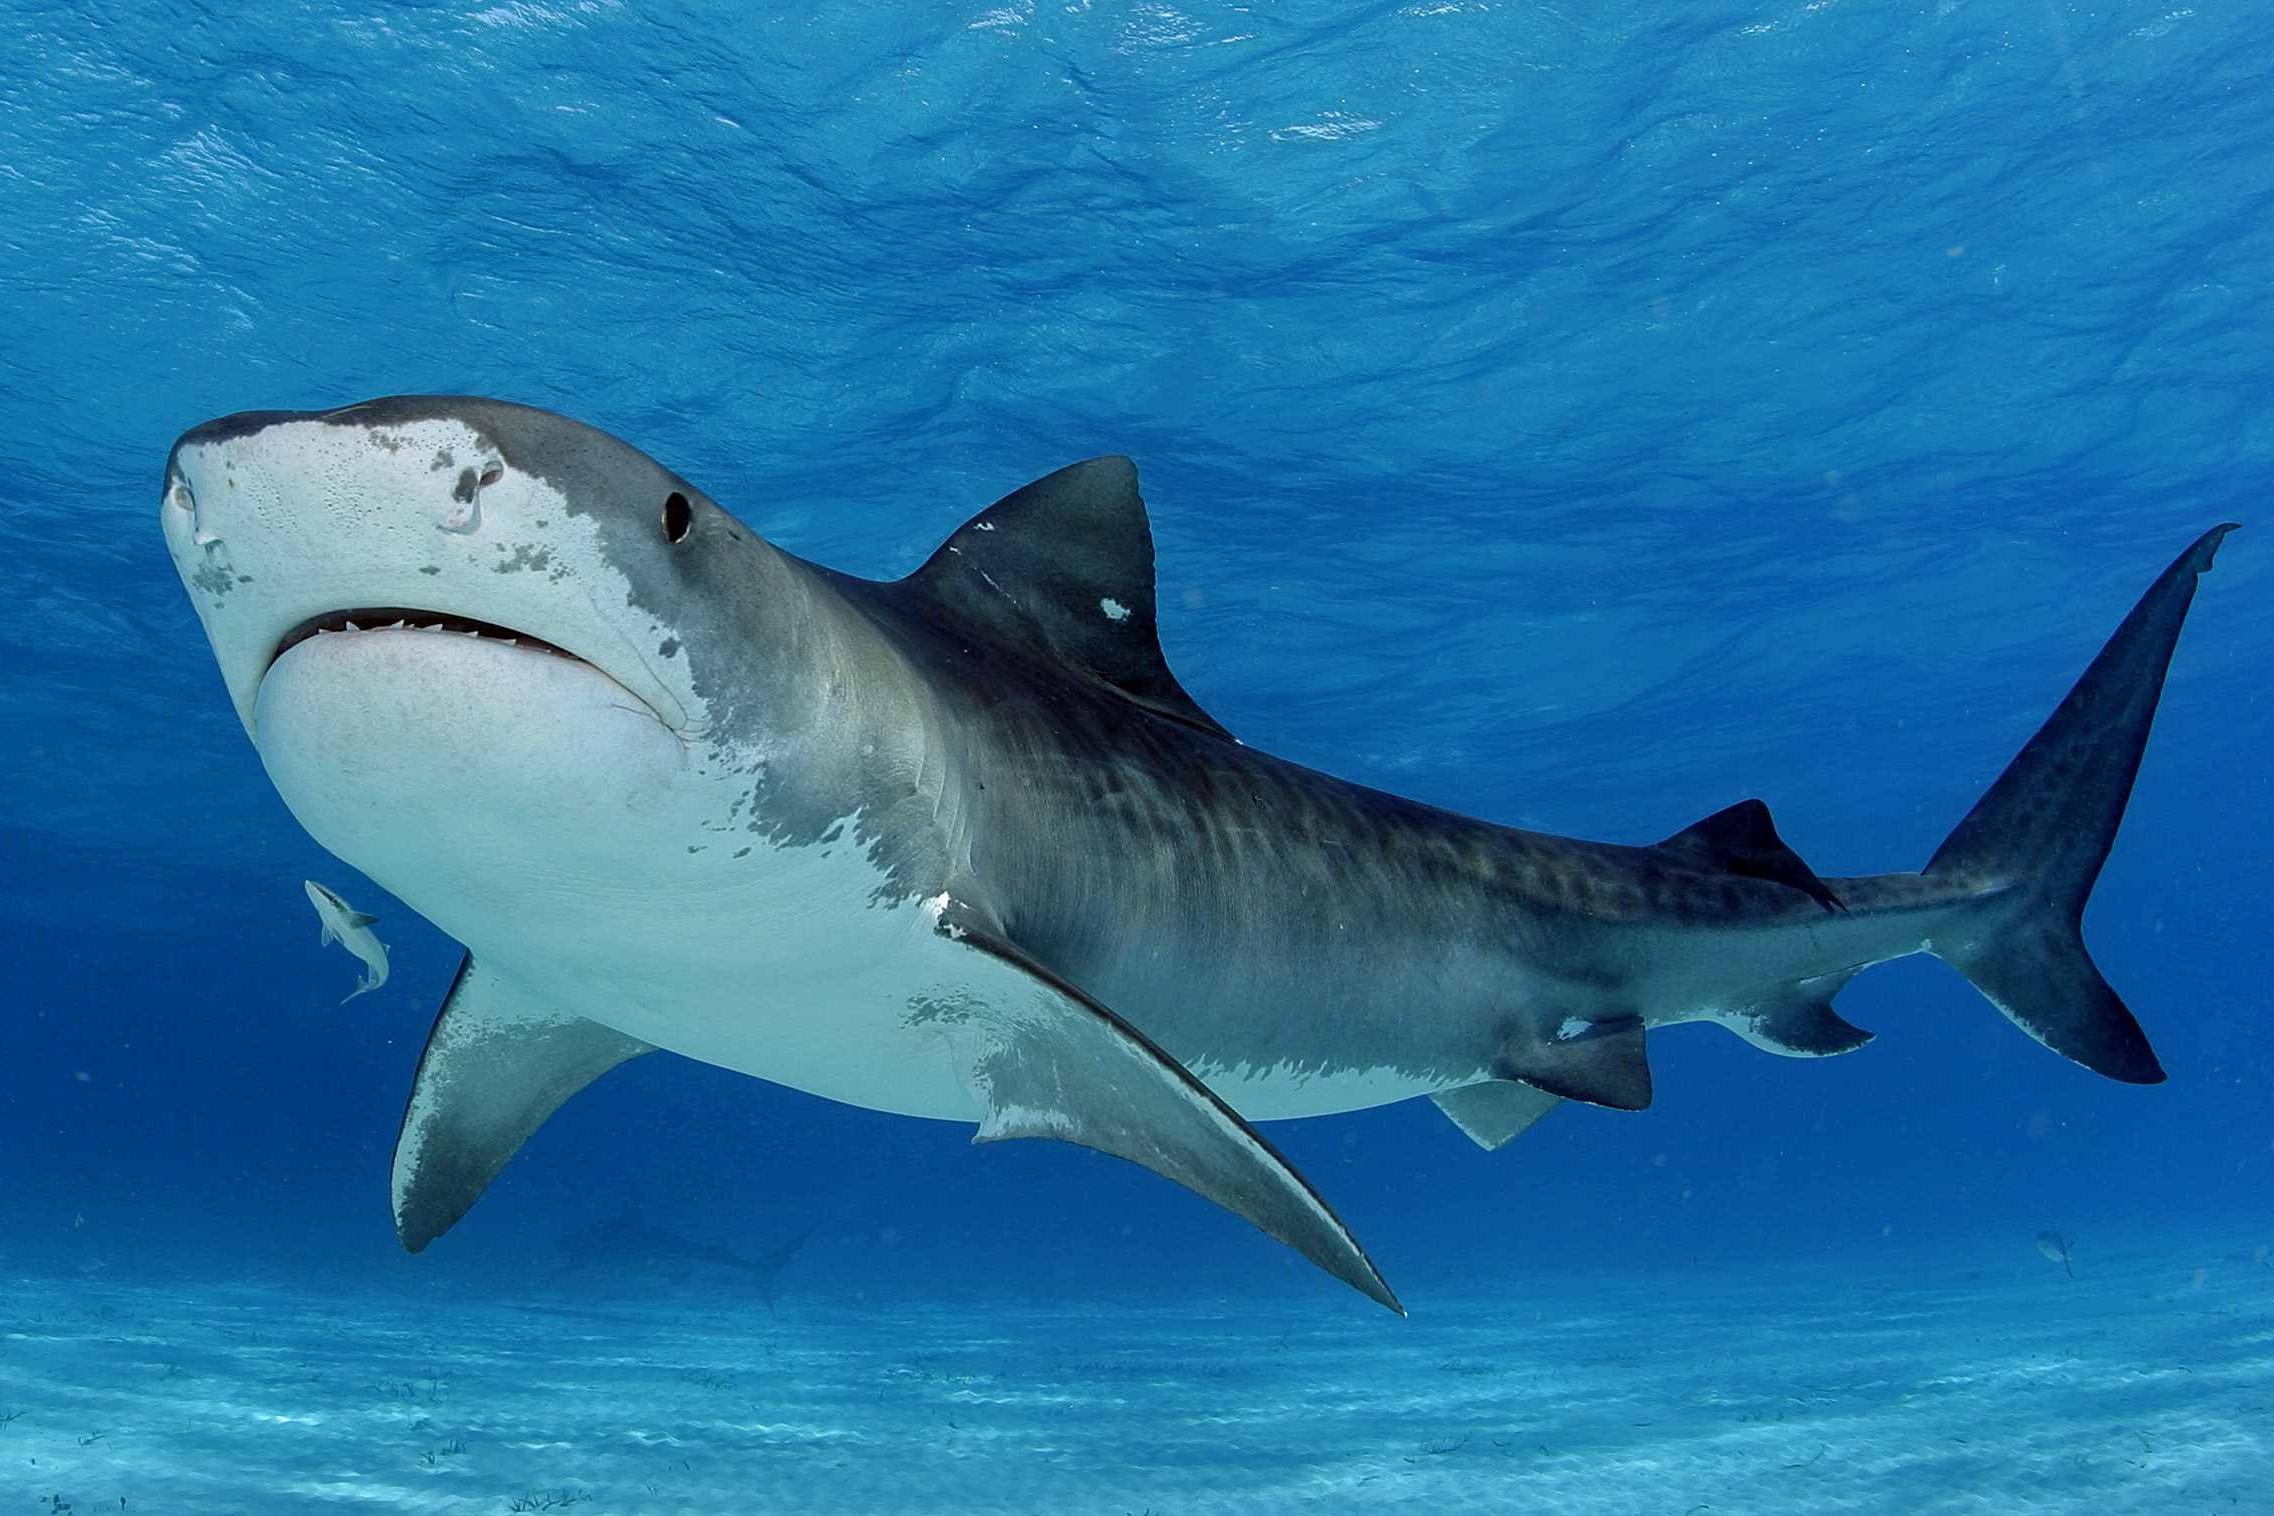 Tiger Shark Backgrounds on Wallpapers Vista